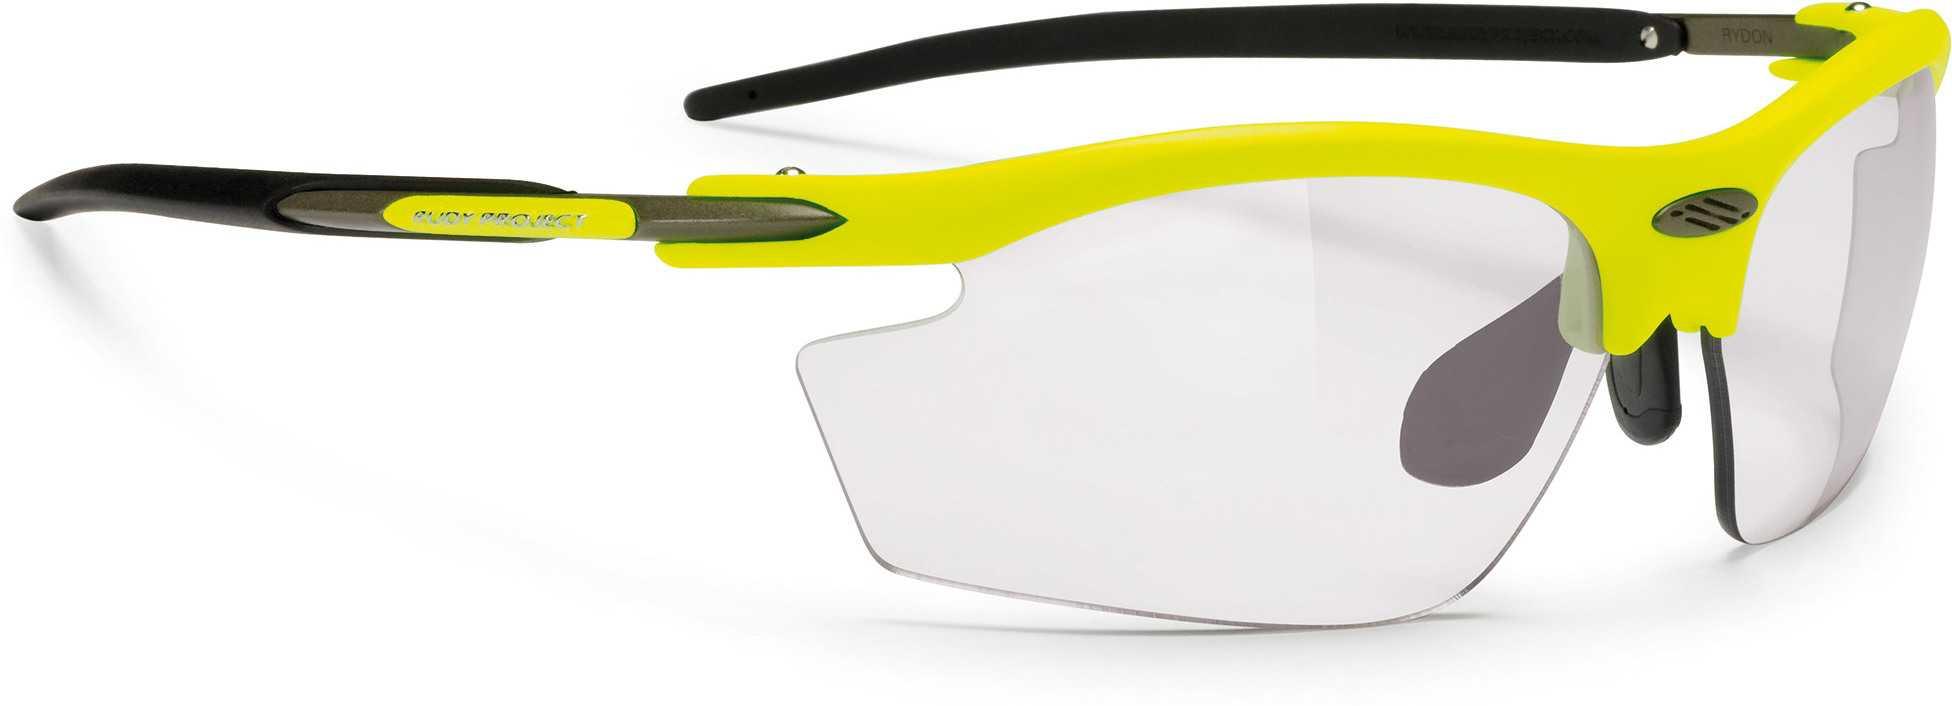 c43a42755ca9 Cykelglasögon Rudy Project Rydon yellow fotokromatisk fluo black